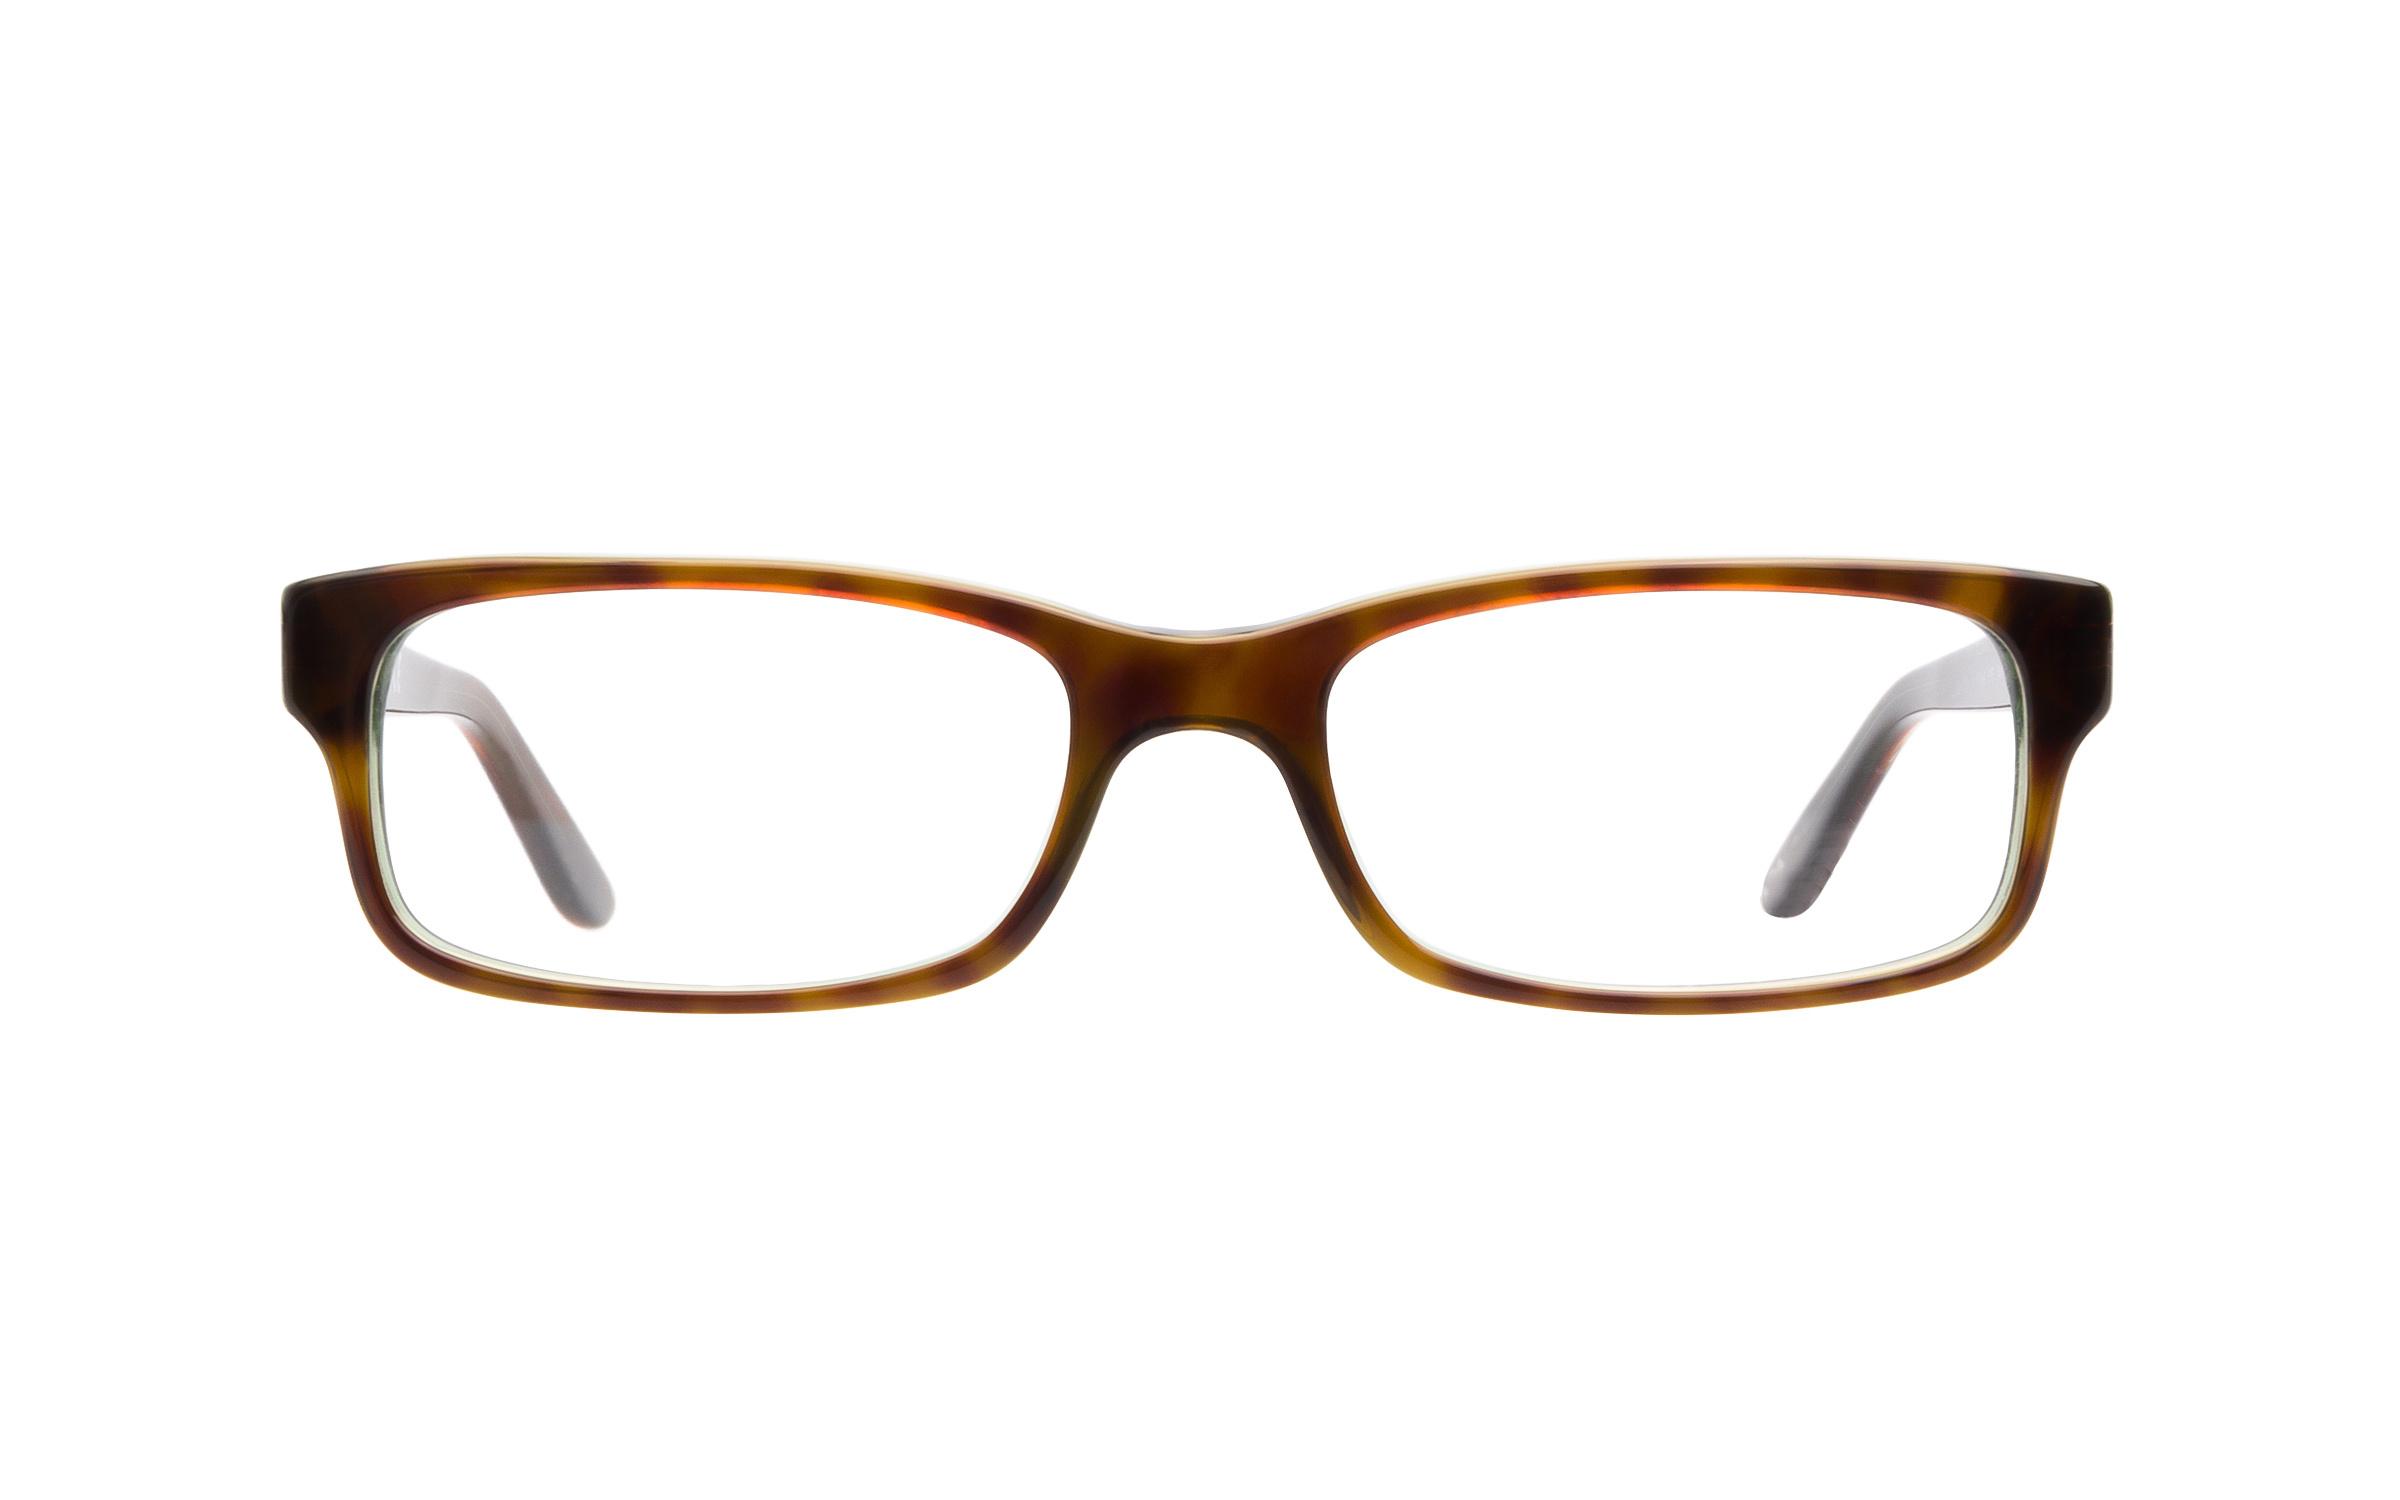 http://www.coastal.com/ - Luxottica Ray-Ban 5187 2445 Green Eyeglasses and Frame in Havana Tortoise – Online Coastal